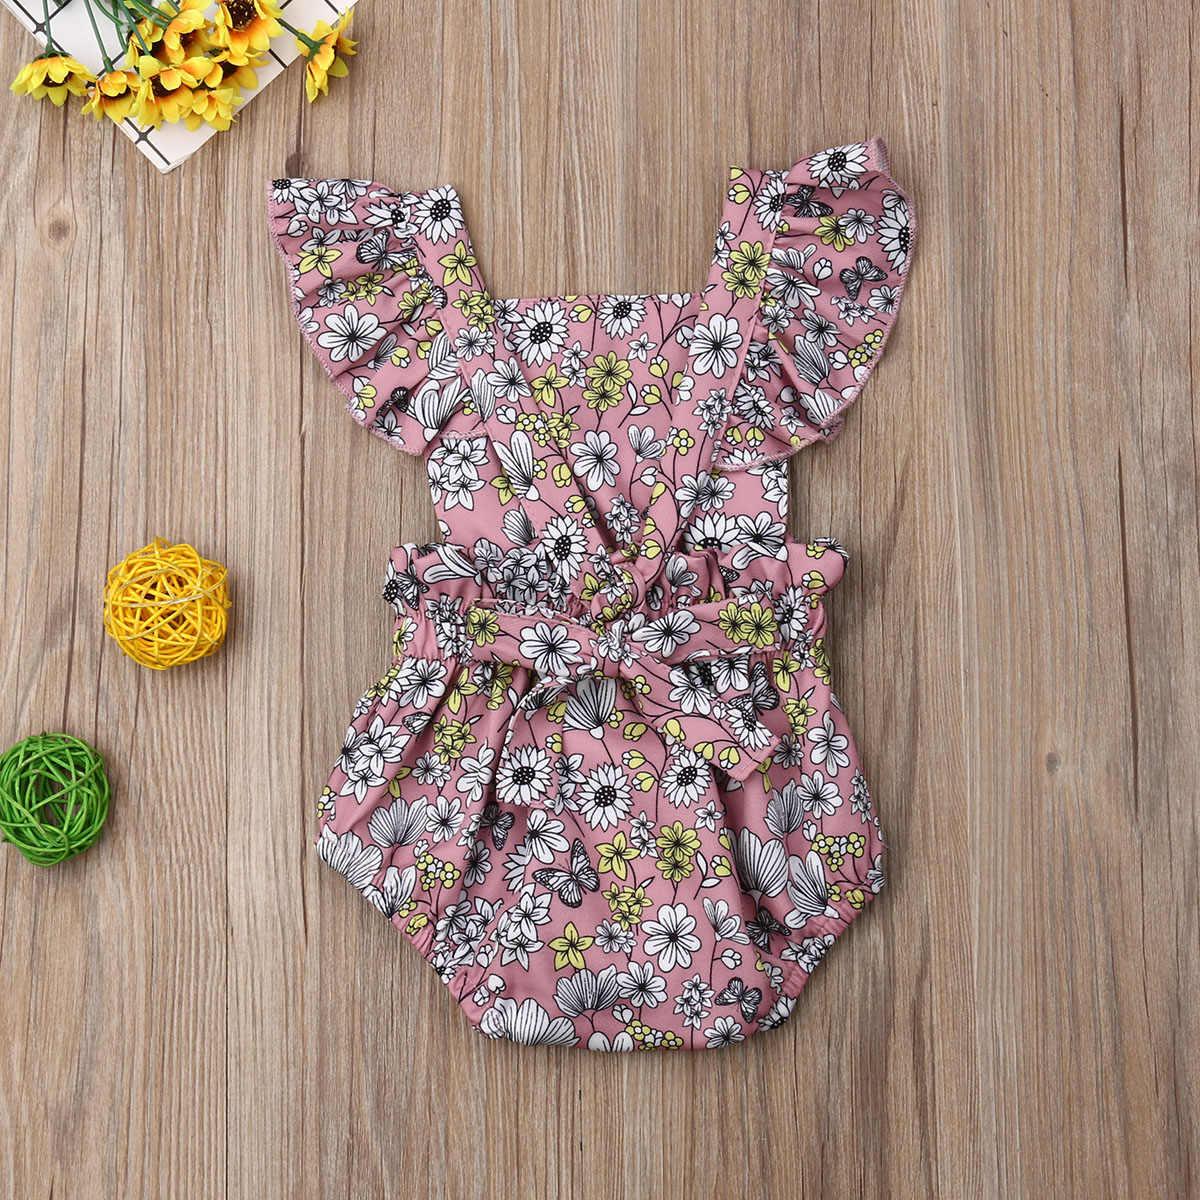 Pasgeboren Kids Baby Meisjes Grote Zusje Bijpassende Outfits Schattige Prinses Bloem Peuter Meisjes Mouwloze Jumpsuit Romper Outfits